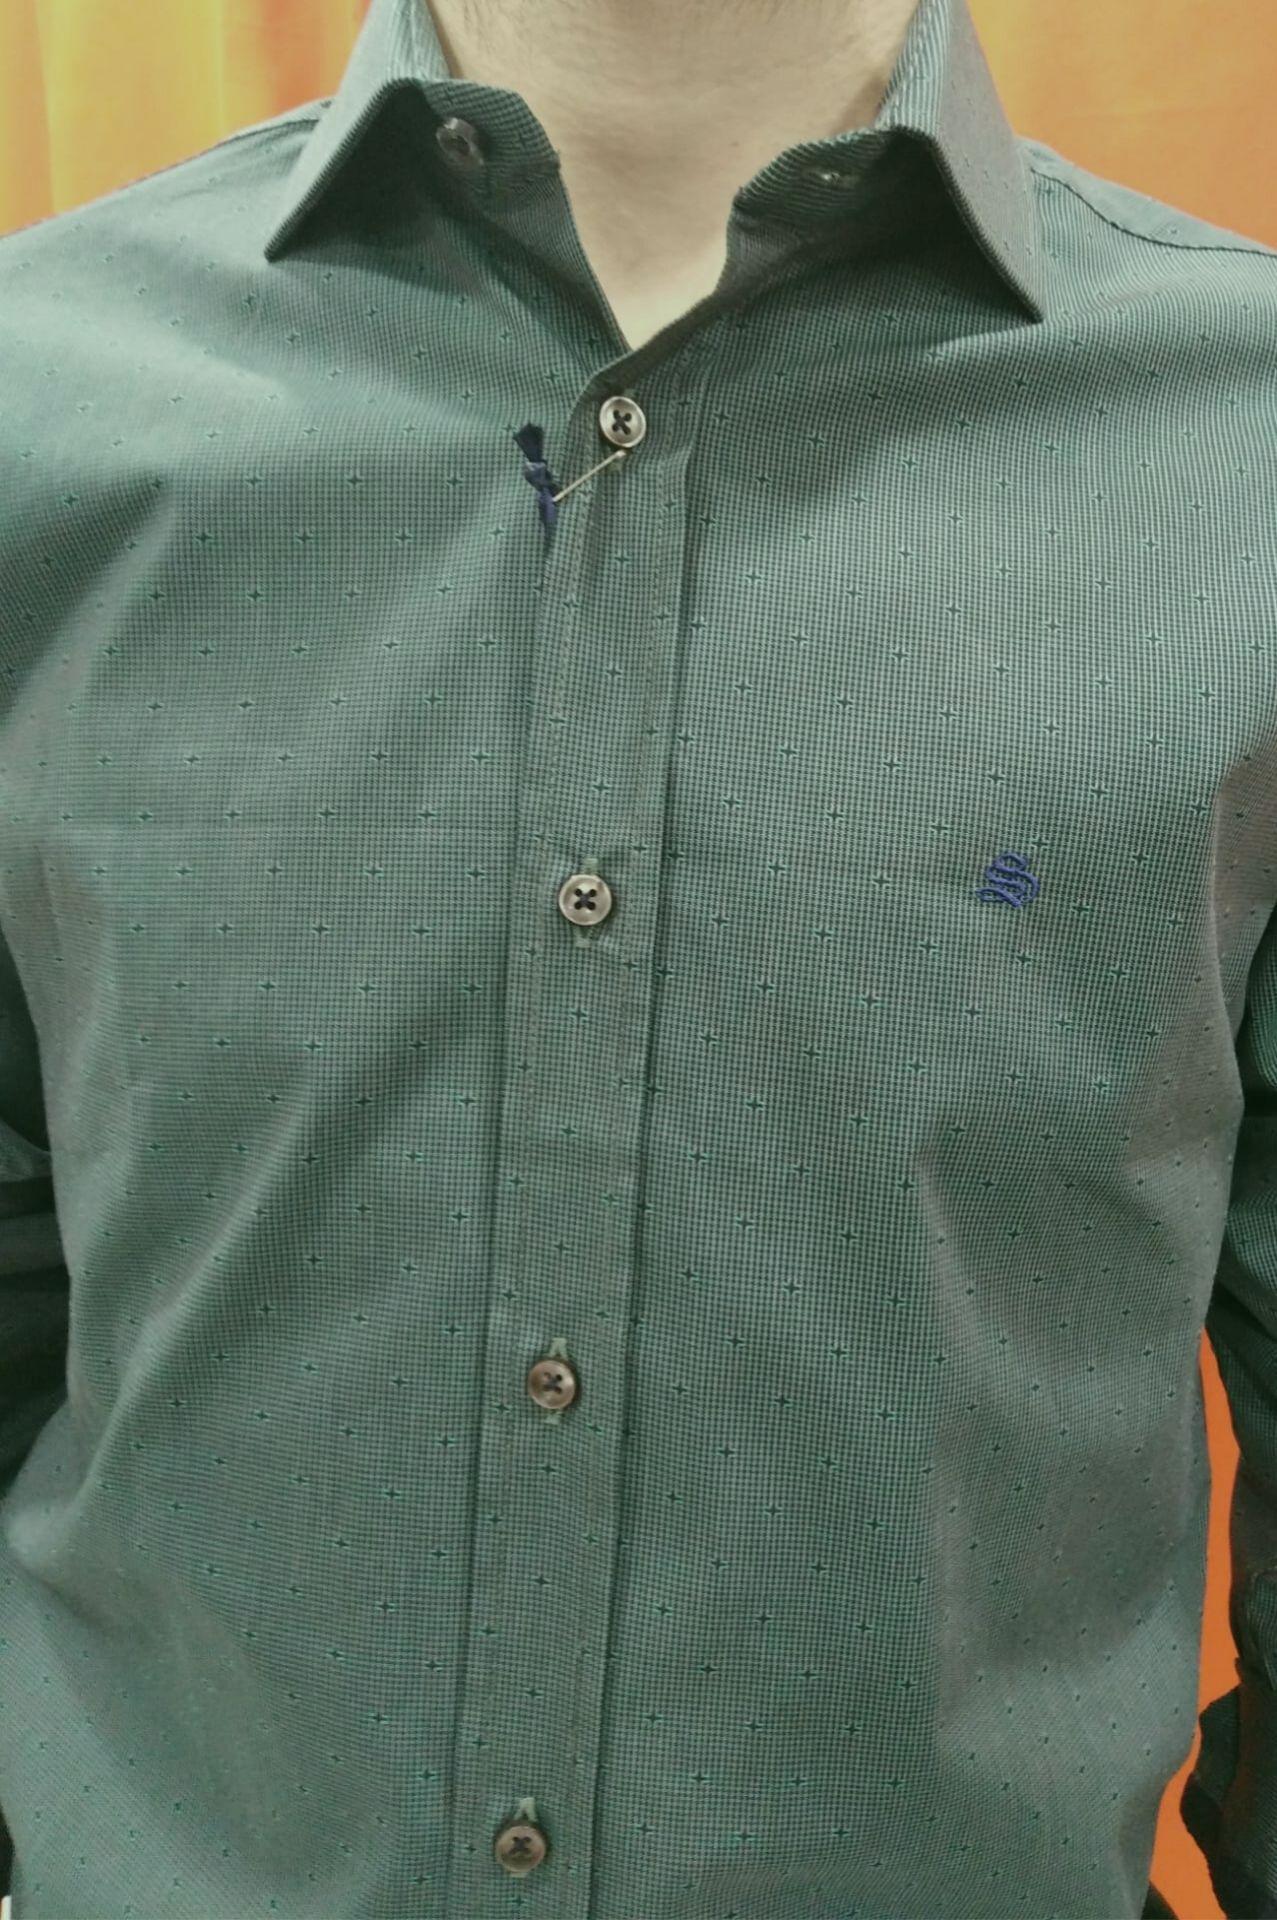 camisa topitos 2 verde